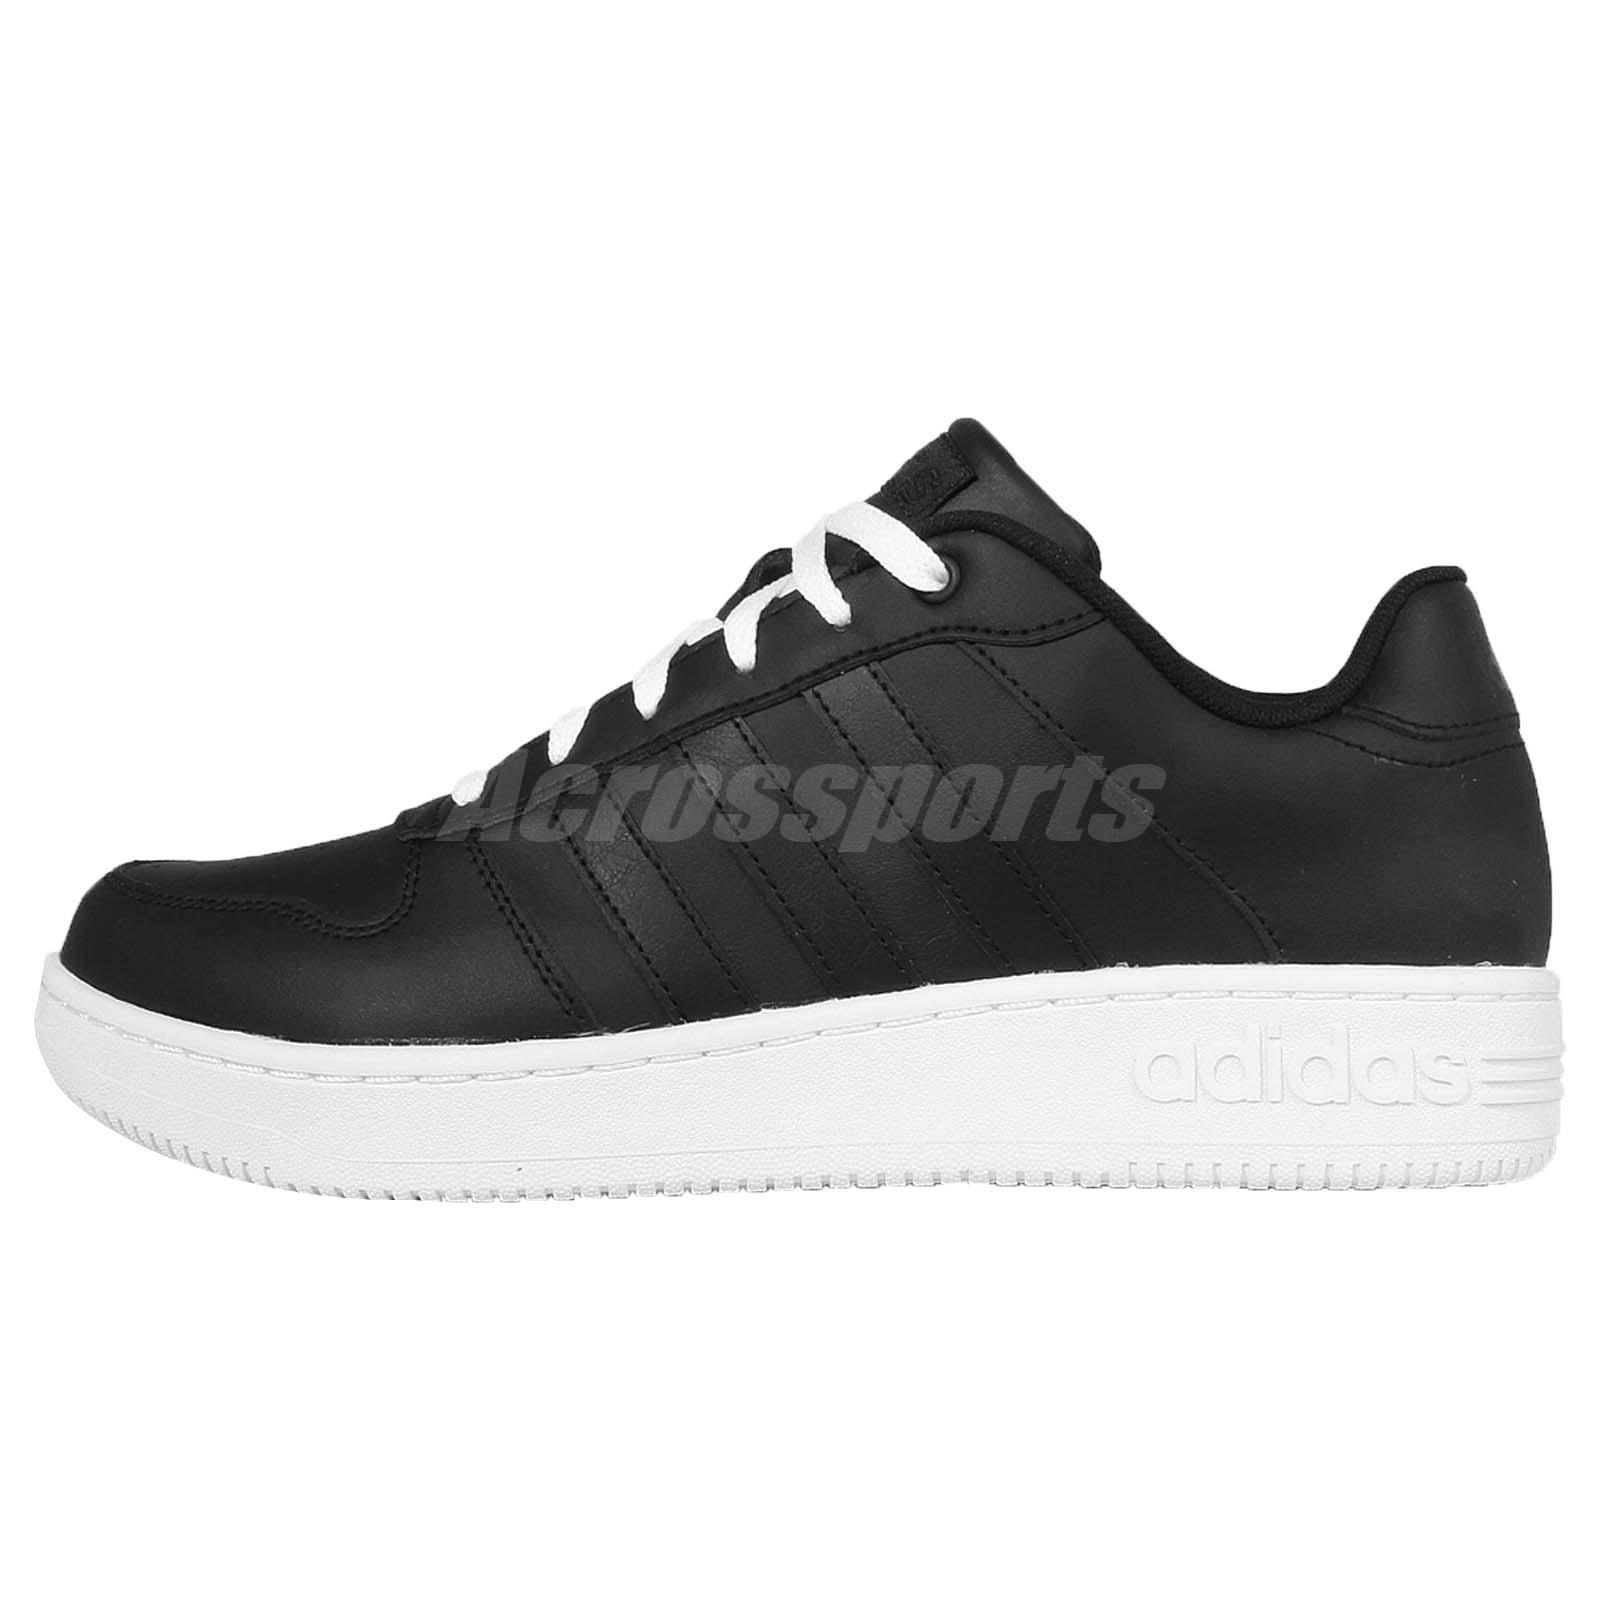 adidas neo label team court black mens casual shoes. Black Bedroom Furniture Sets. Home Design Ideas